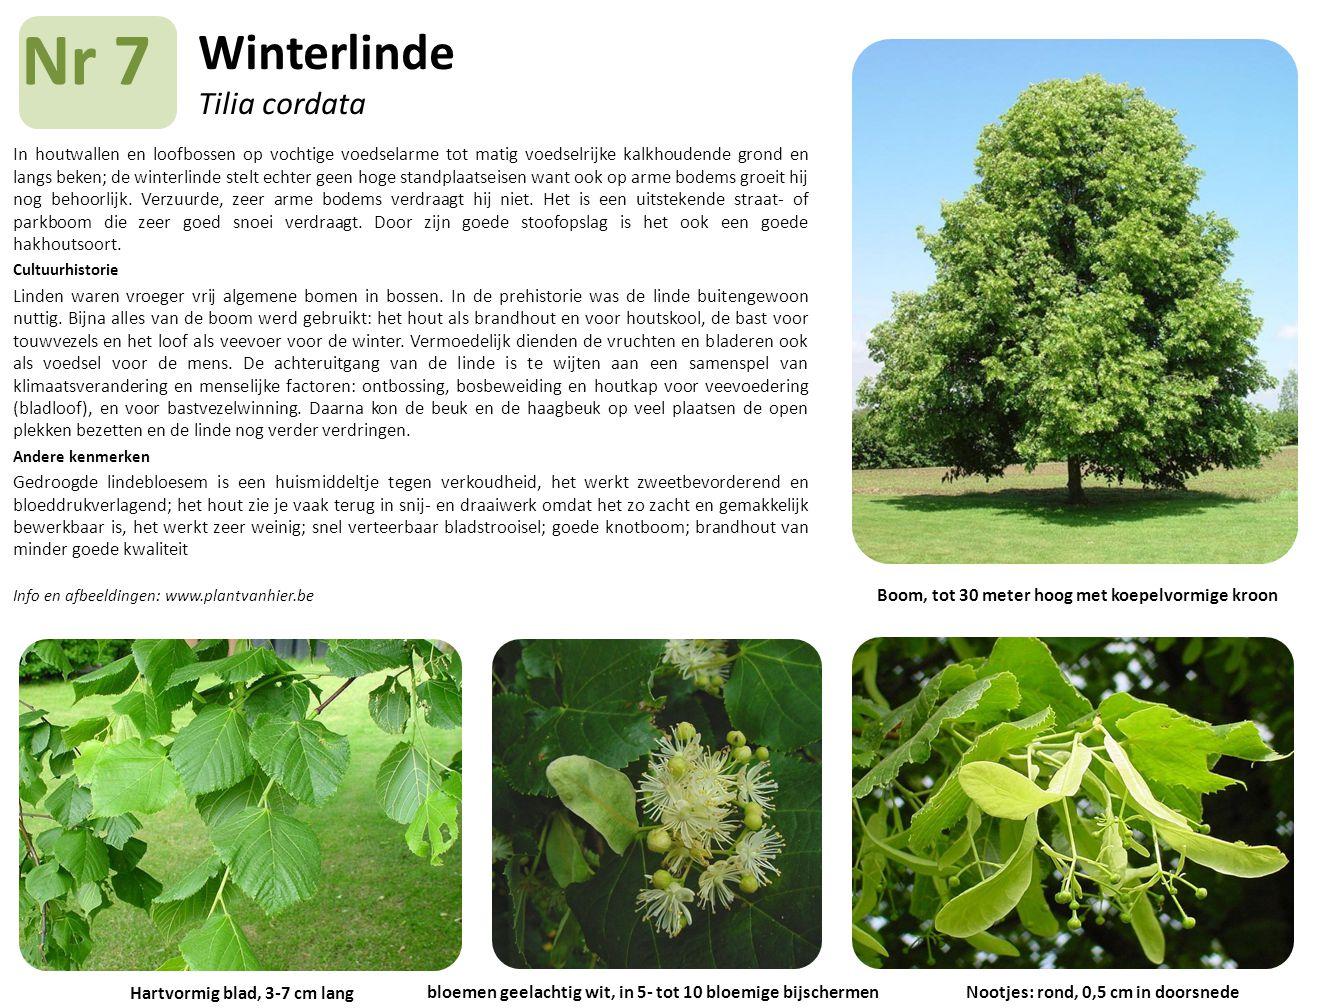 Winterlinde Tilia cordata